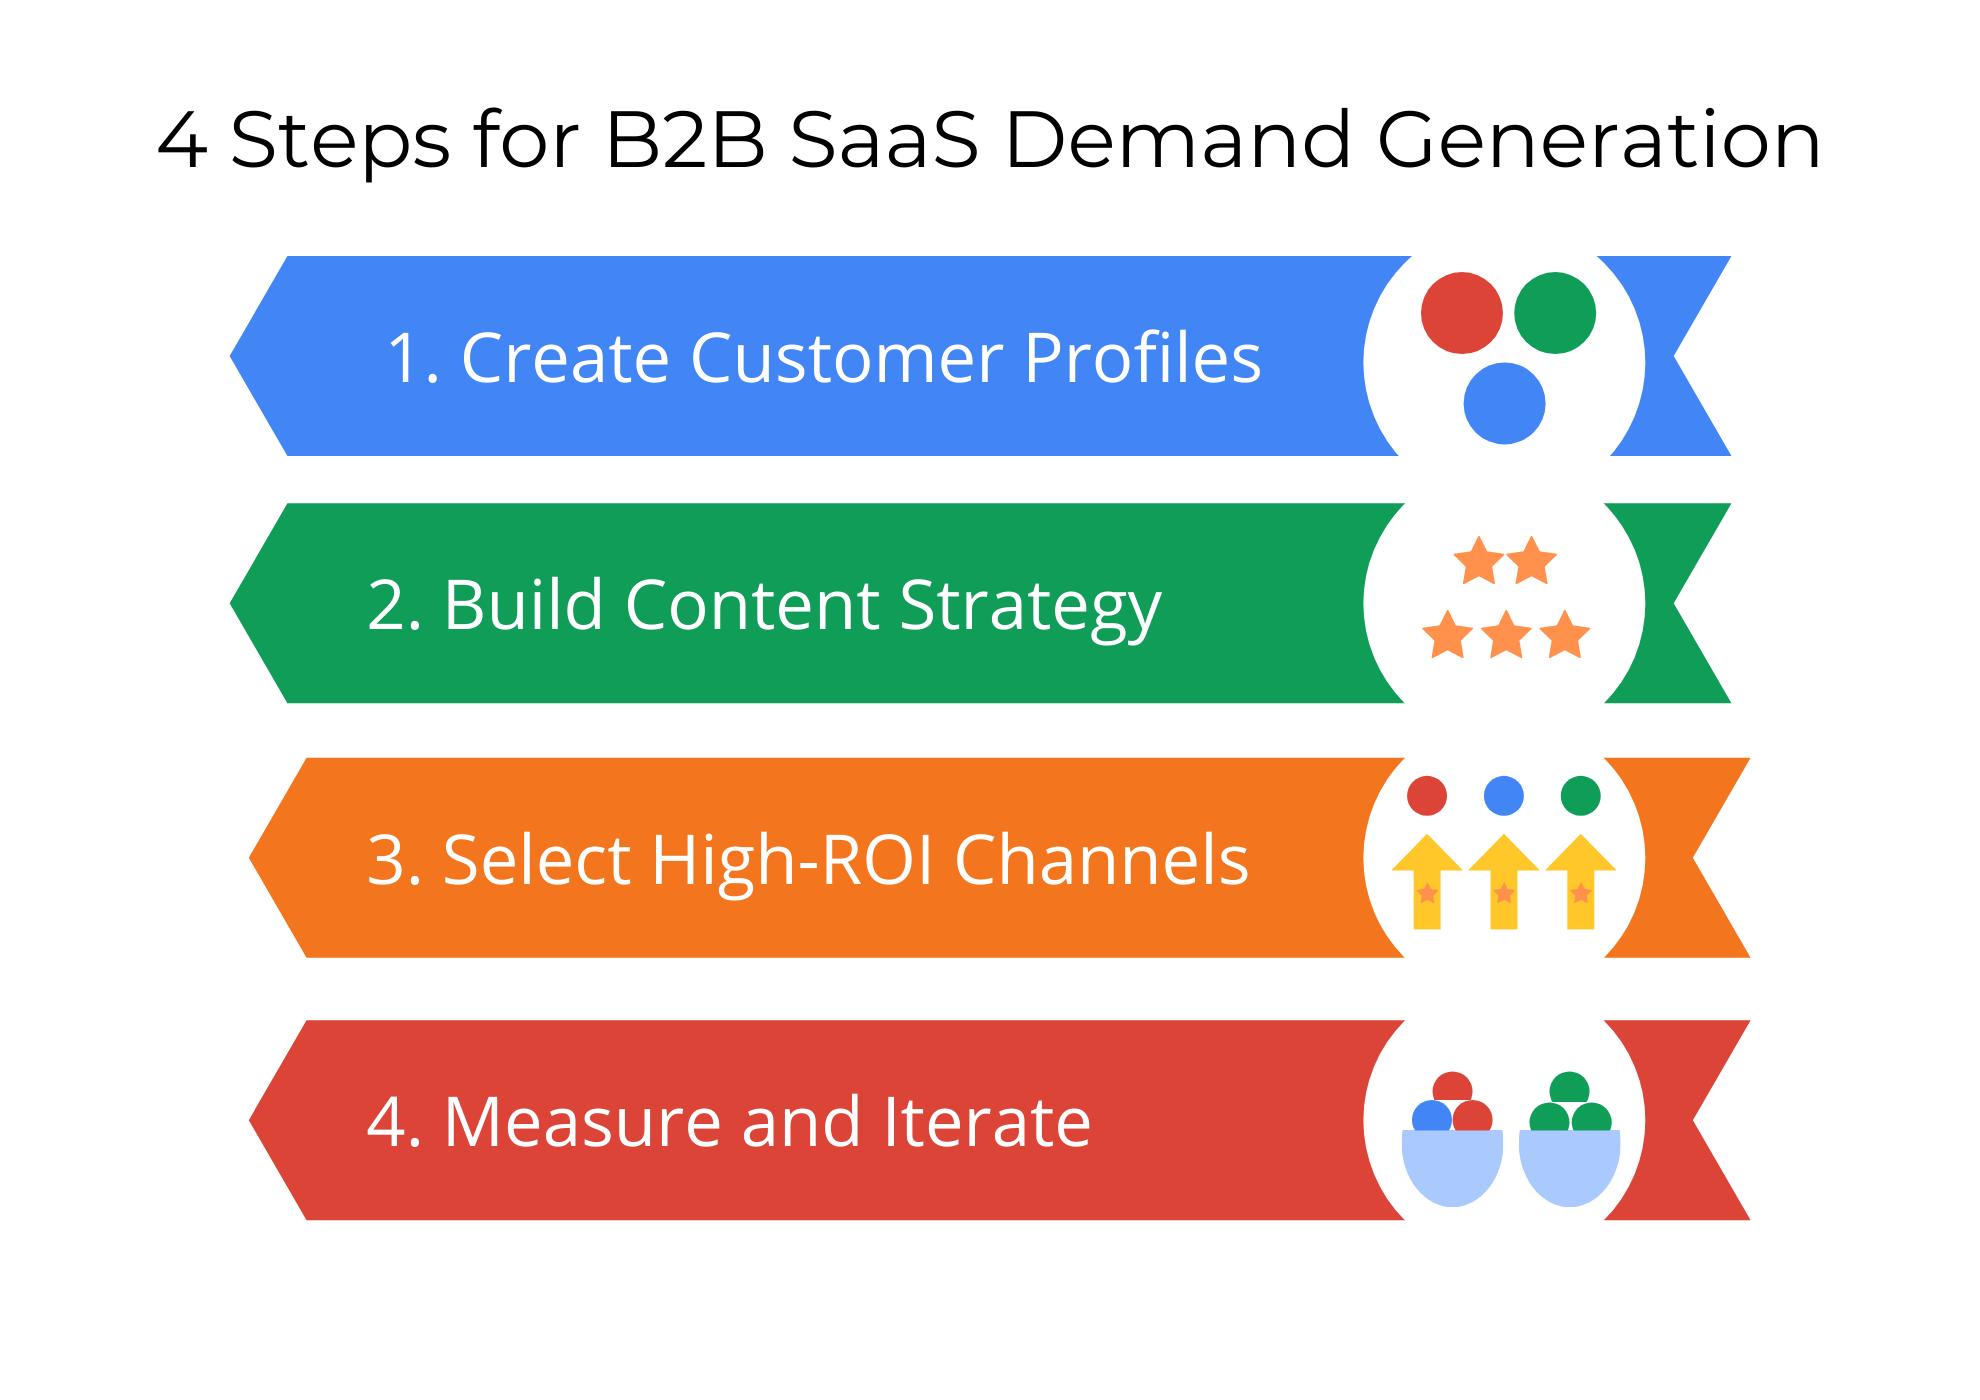 B2B SaaS Demand Generation: 2021-2022 Guide